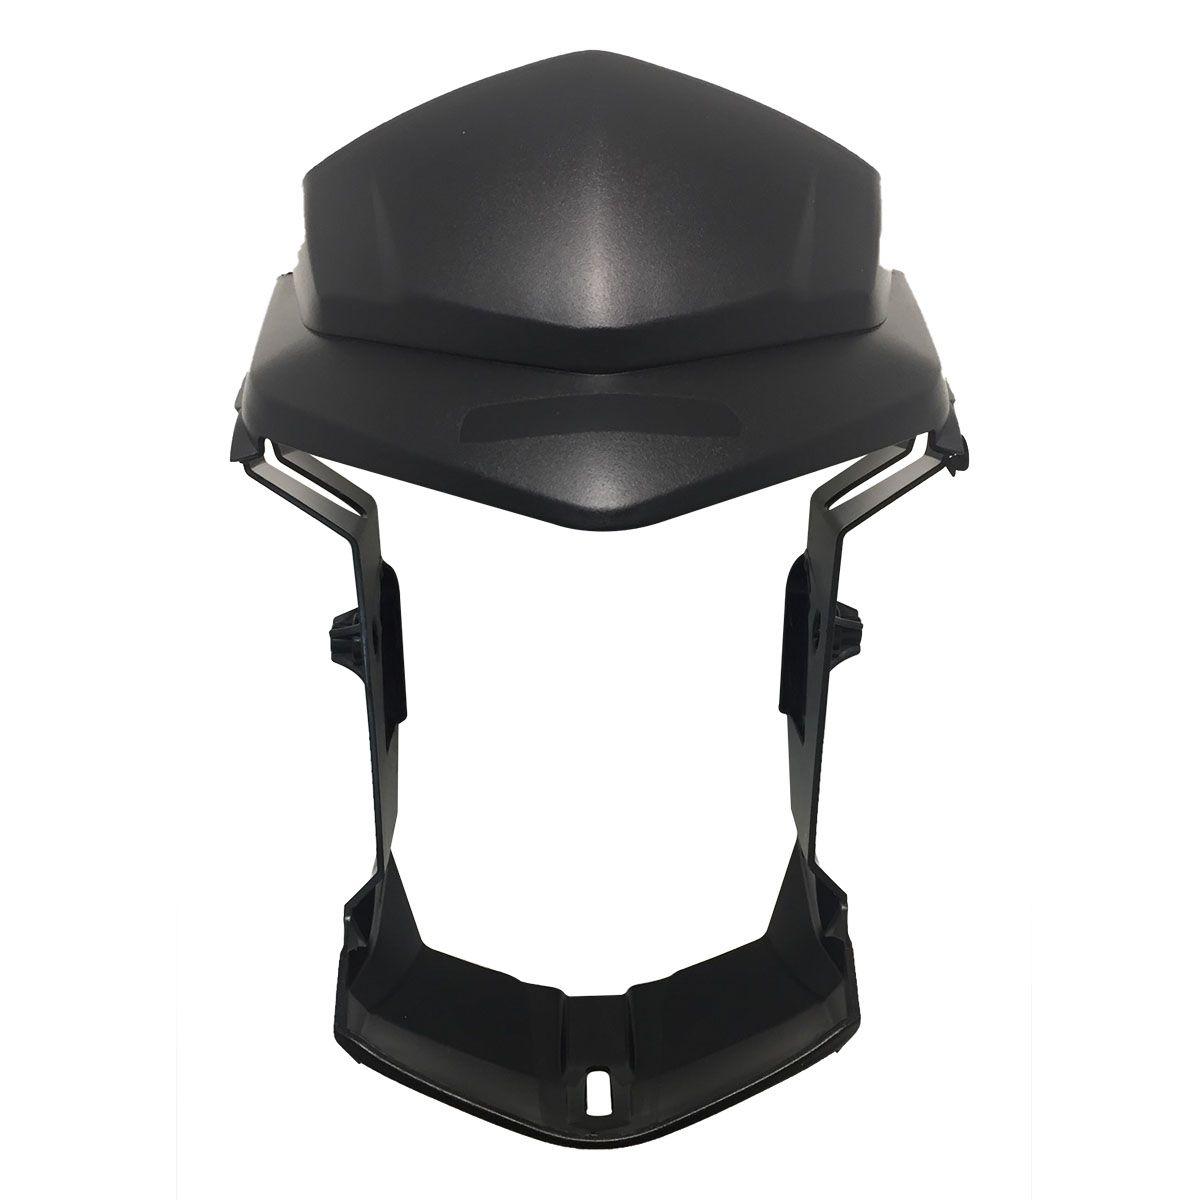 Máscara do Farol Honda CG 125 Fan, 150 Titan Ks/Es/Esd 2014 Preto Injetado - Carenagem Sportive